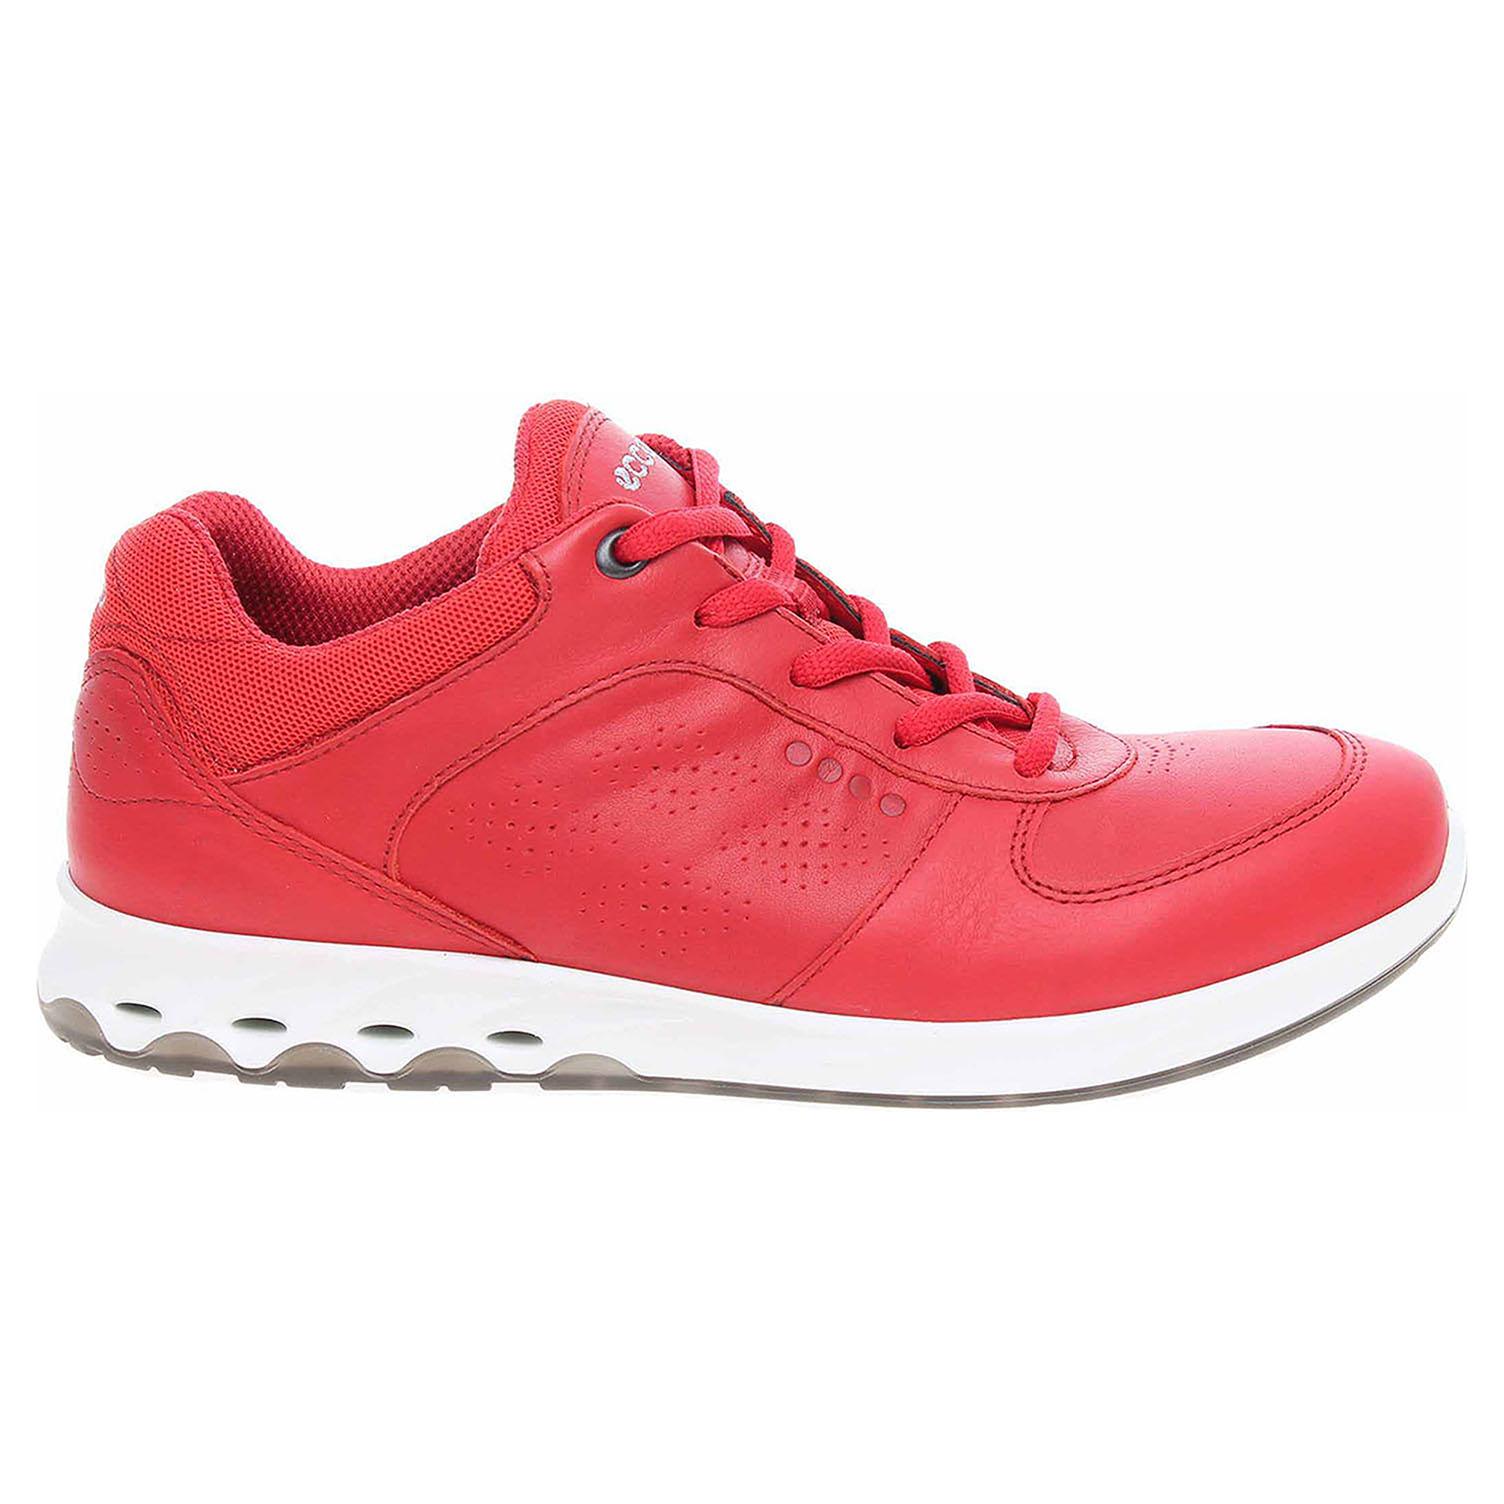 Ecco Ecco Wayfly dámská obuv 83521301046 tomato 23200784 ba57821962c